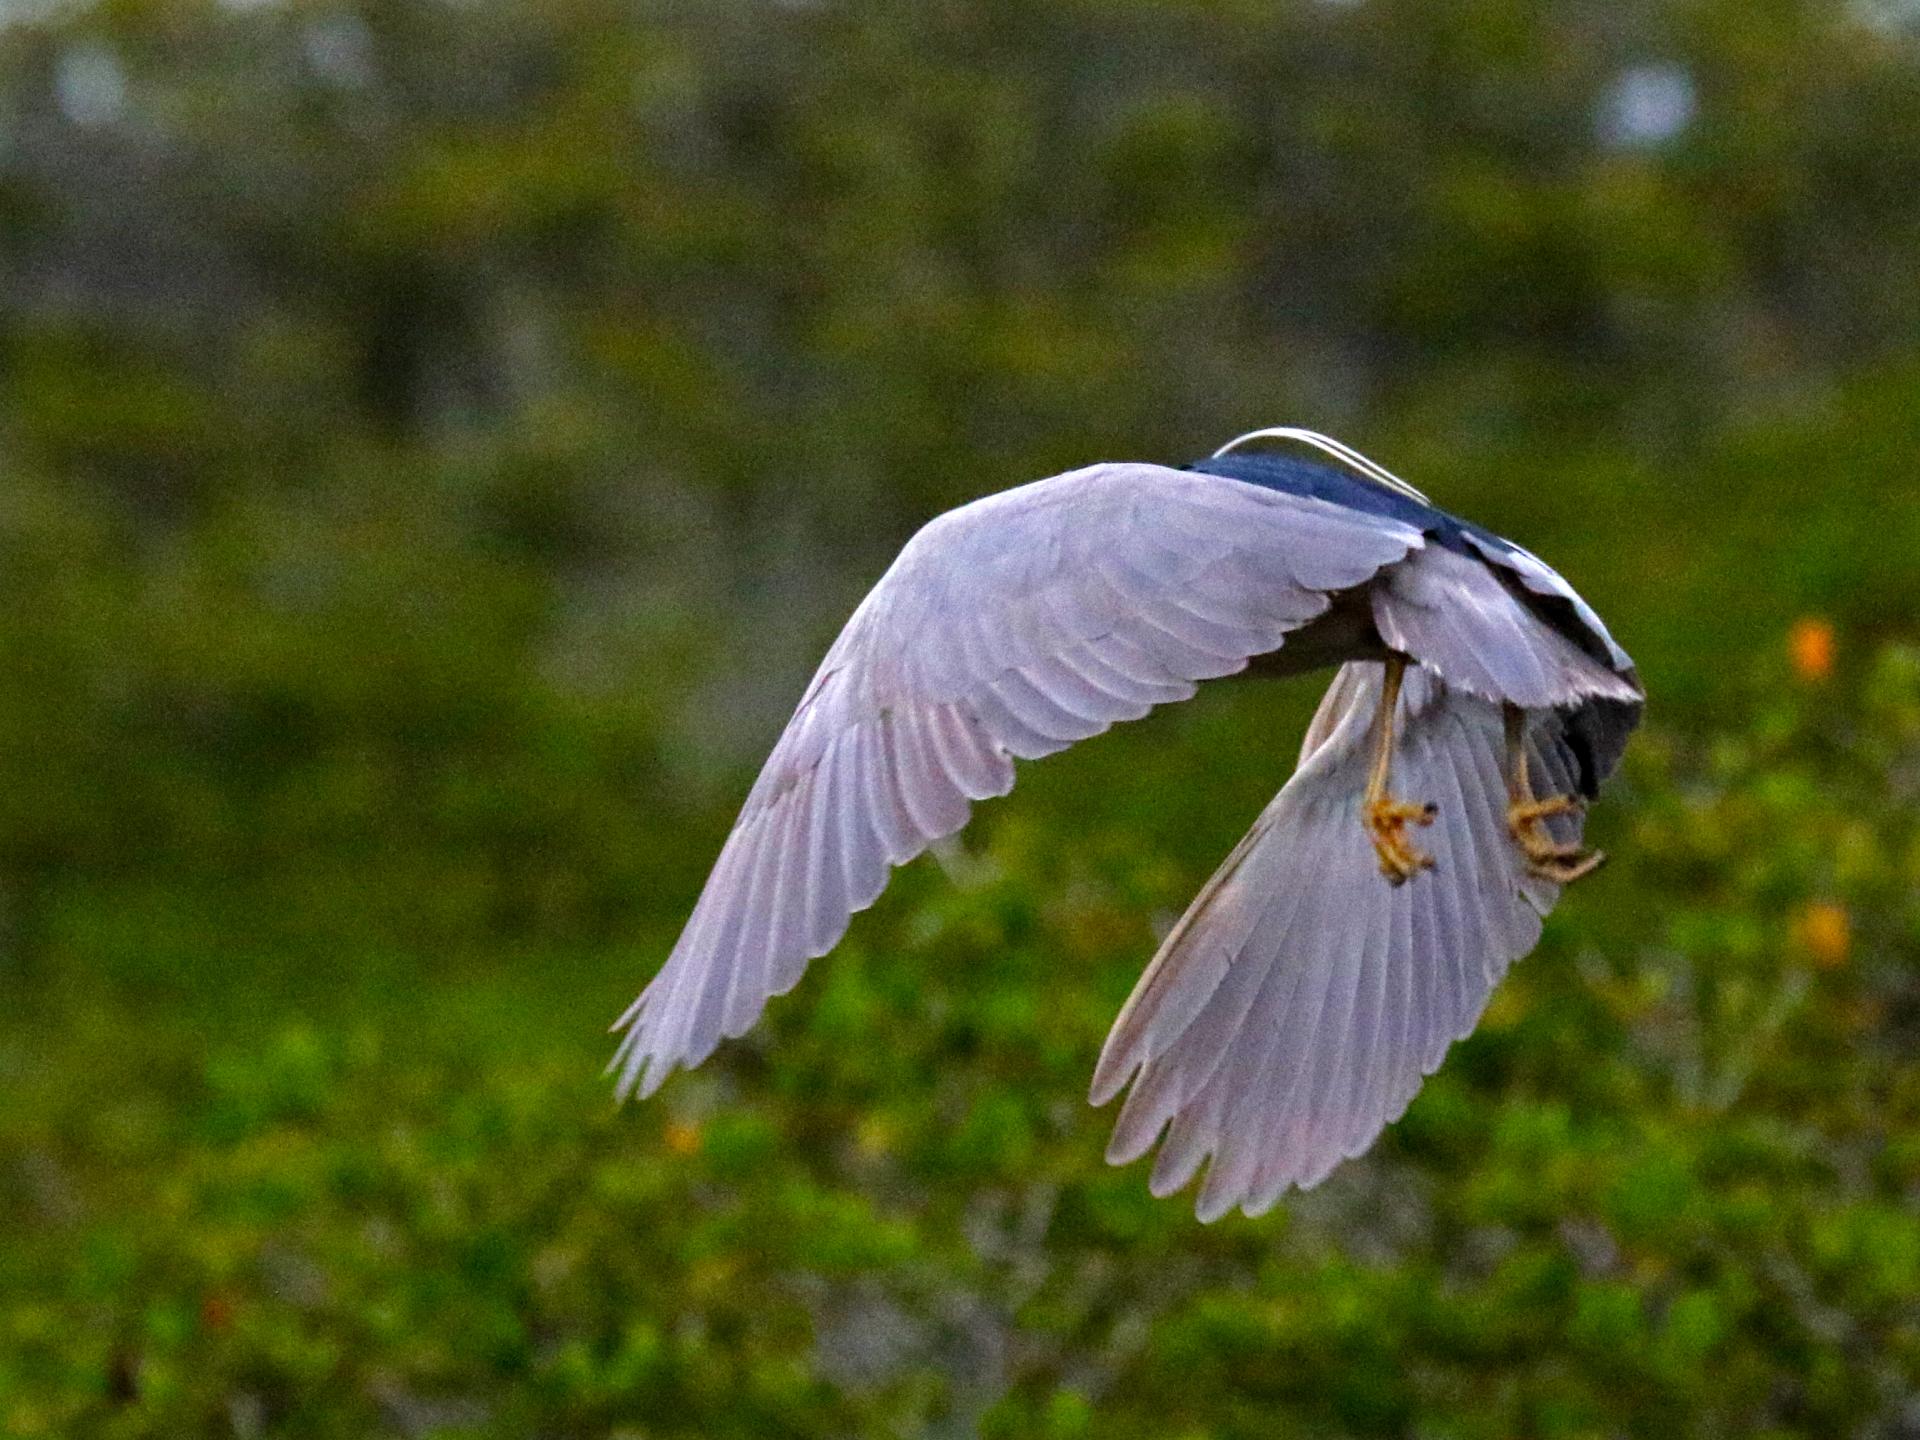 Beaches and Birds Participates in Global Birding Initiative